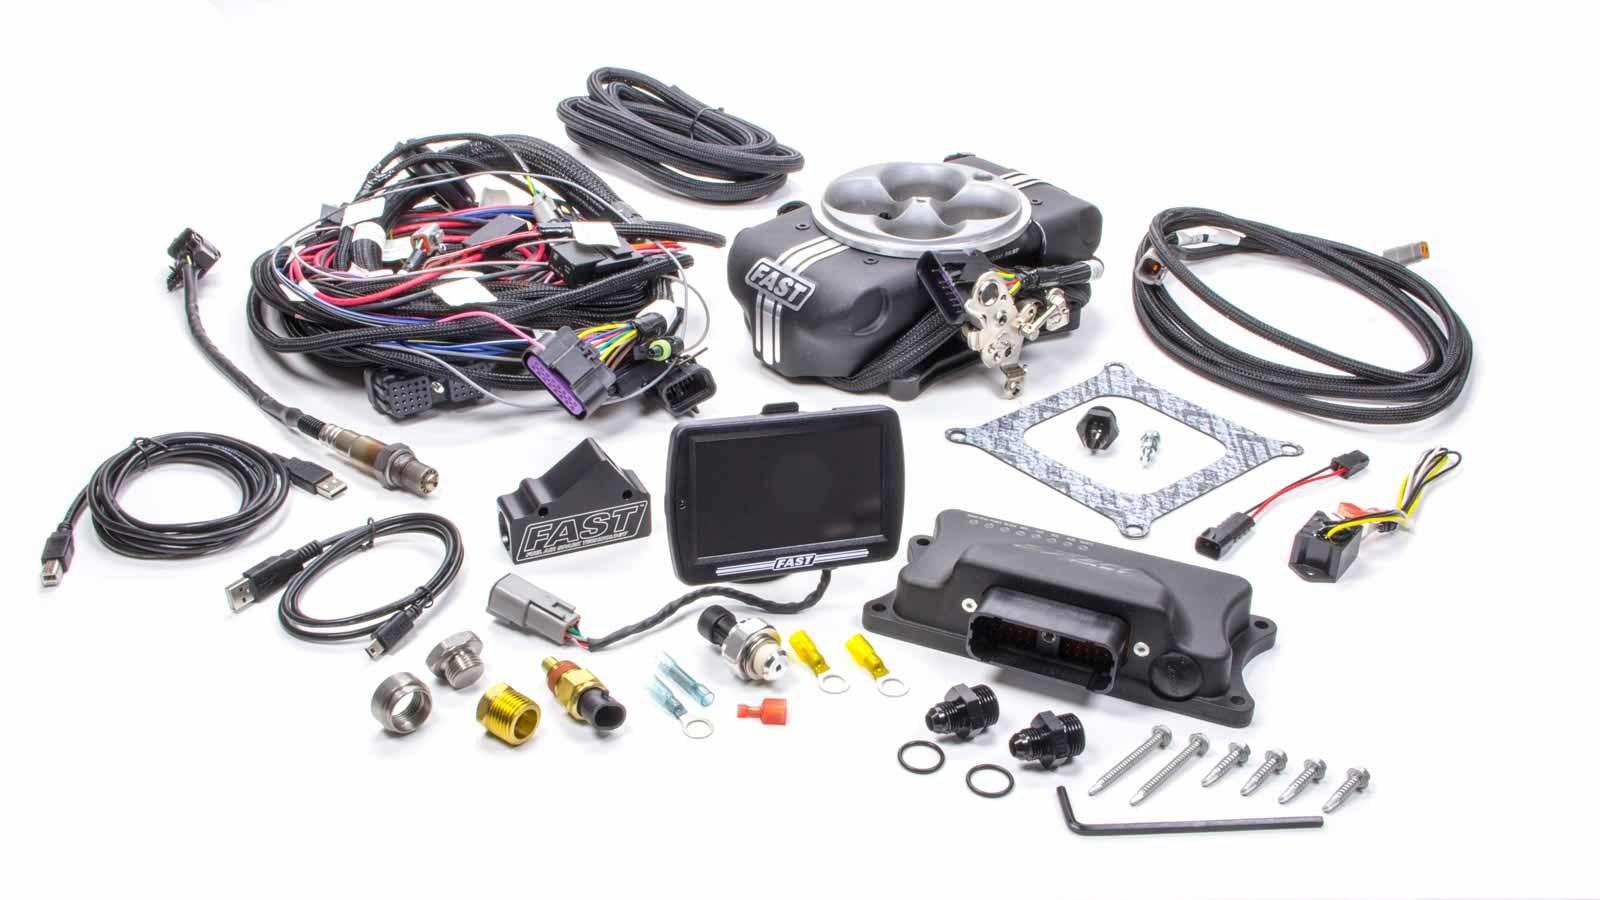 Fast Electronics EZ-EFI 2.0 Base Kit